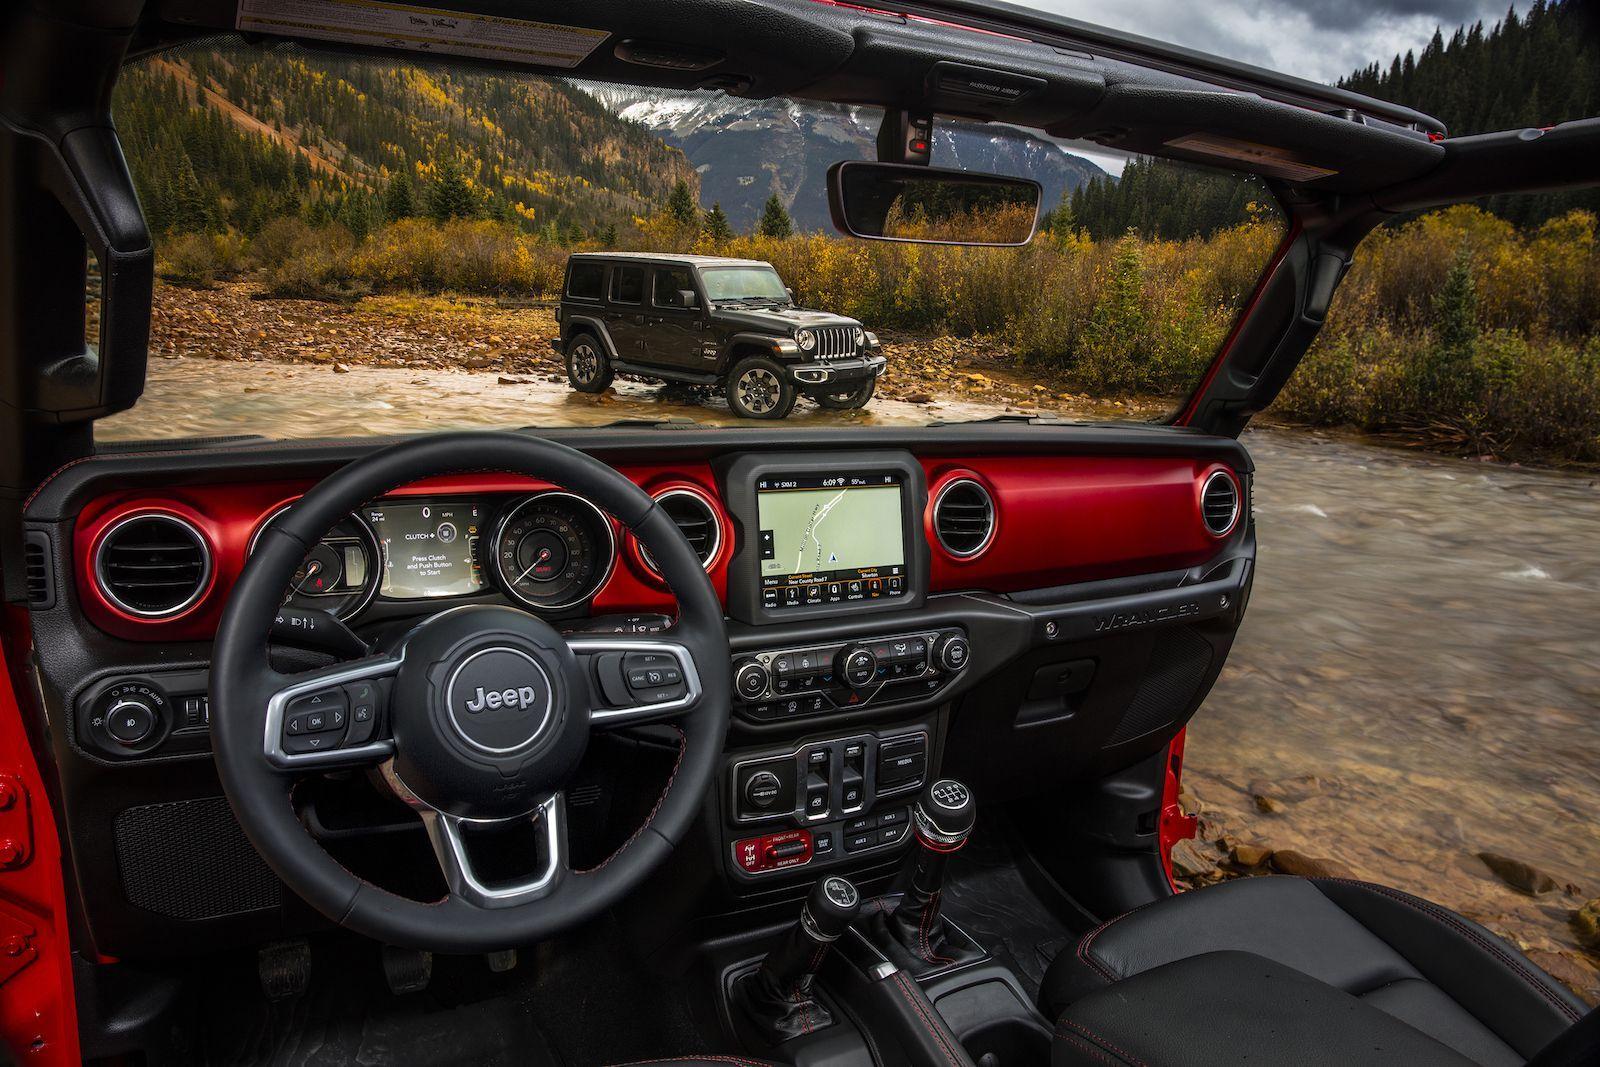 2019 Jeep Wrangler Unlimited Interior Google Search Jeep